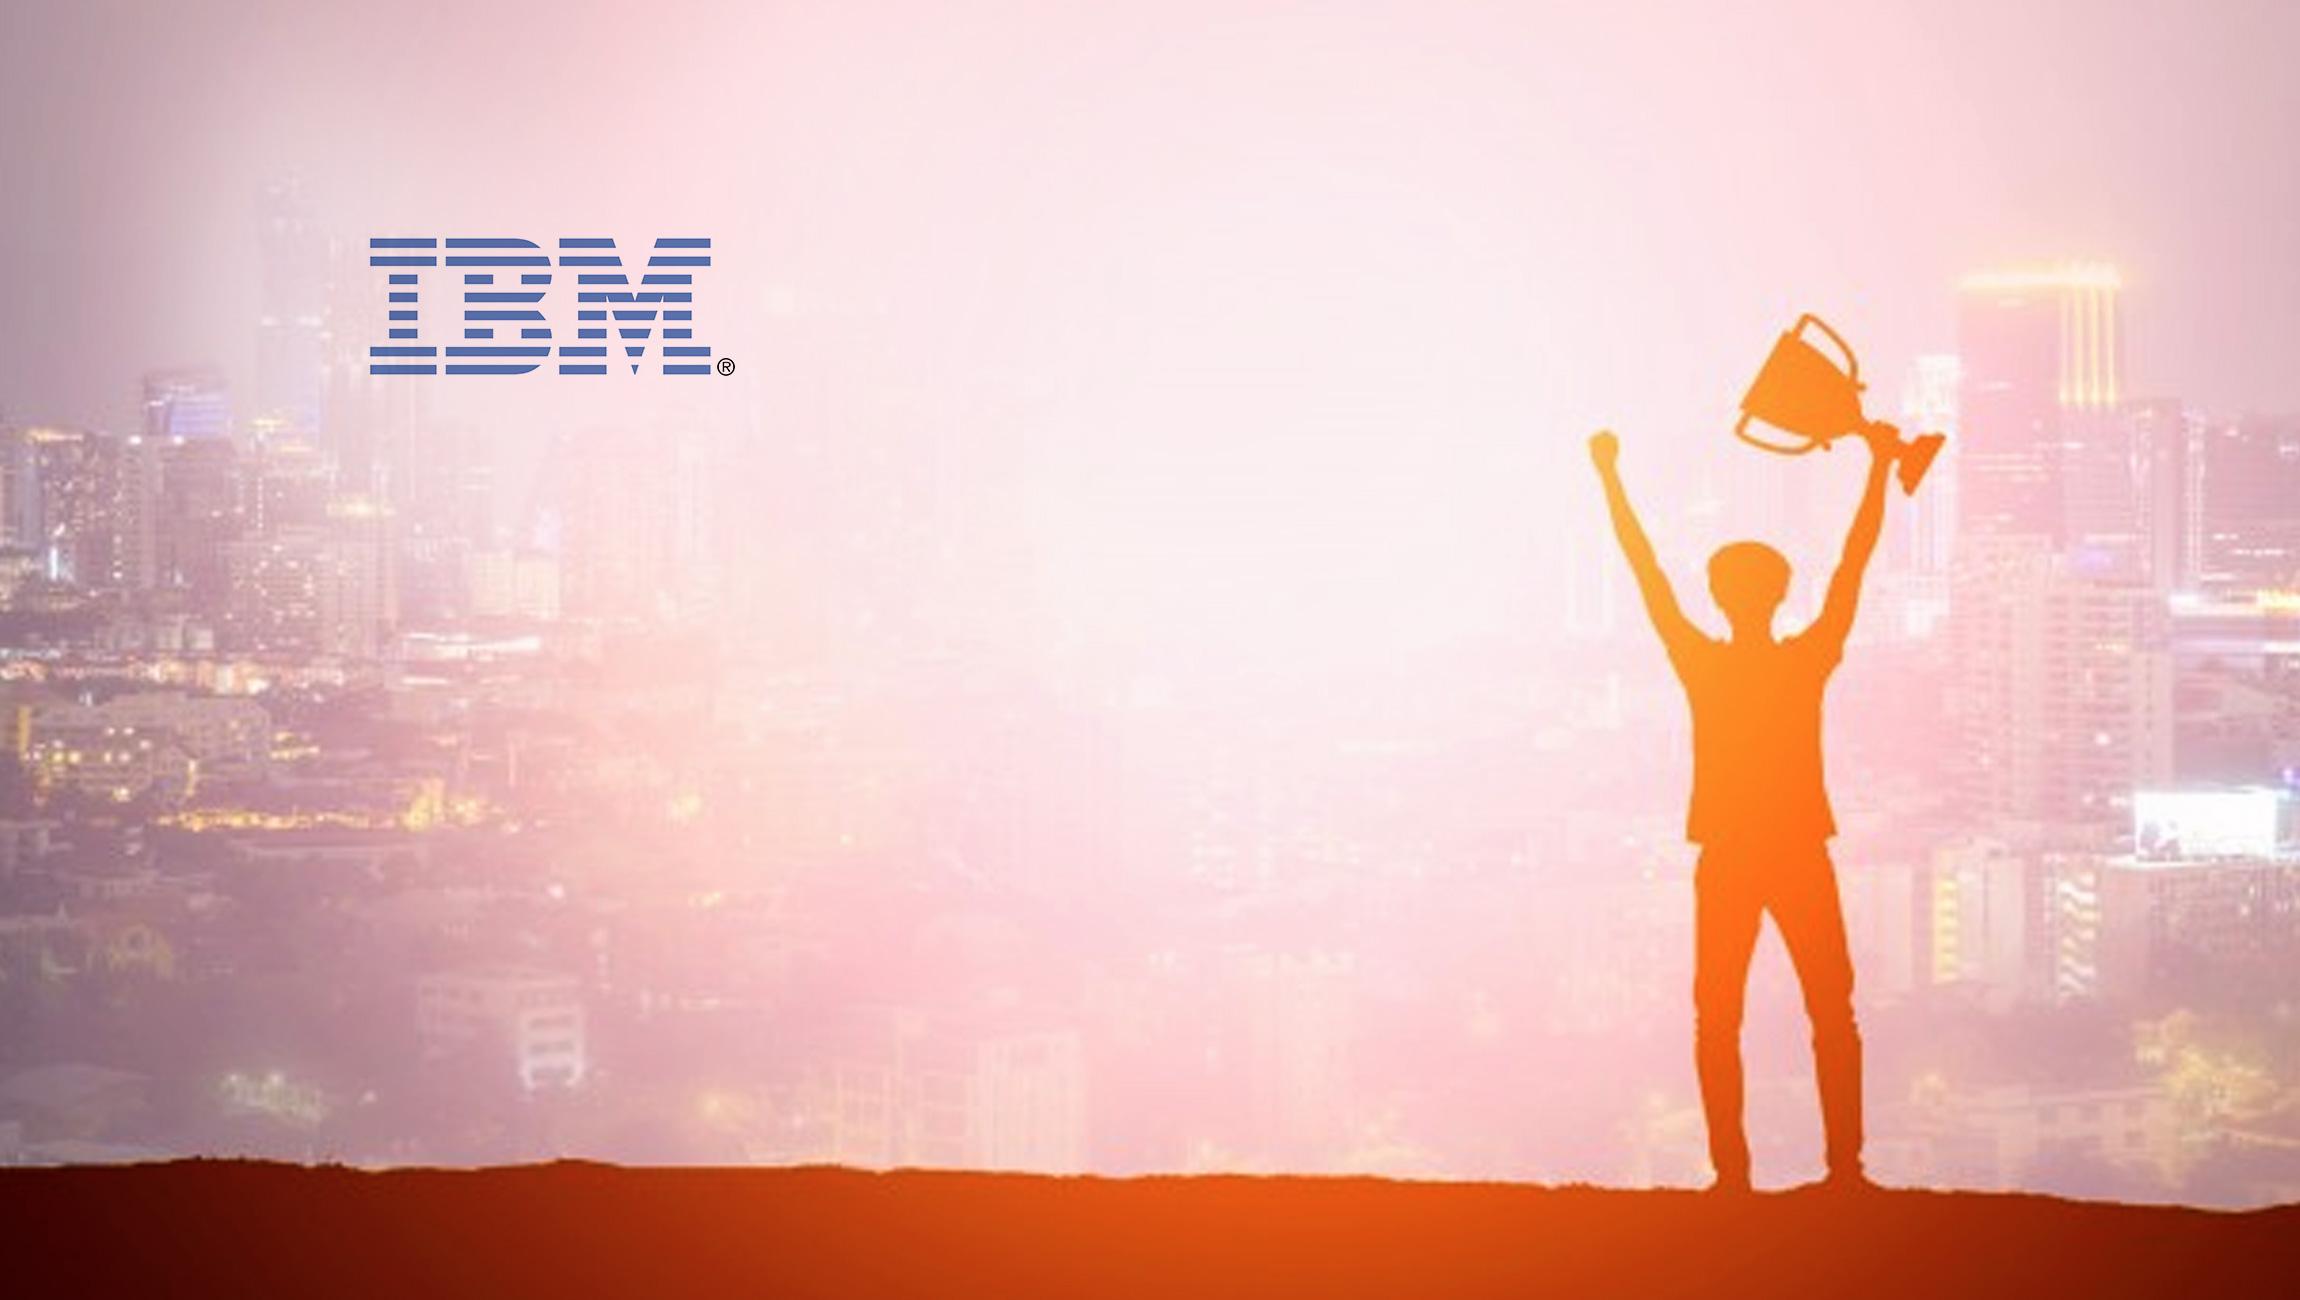 IBM's Global Supply Chain Transformation Wins 2019 NextGen Supply Chain Leadership Award for Blockchain and IoT